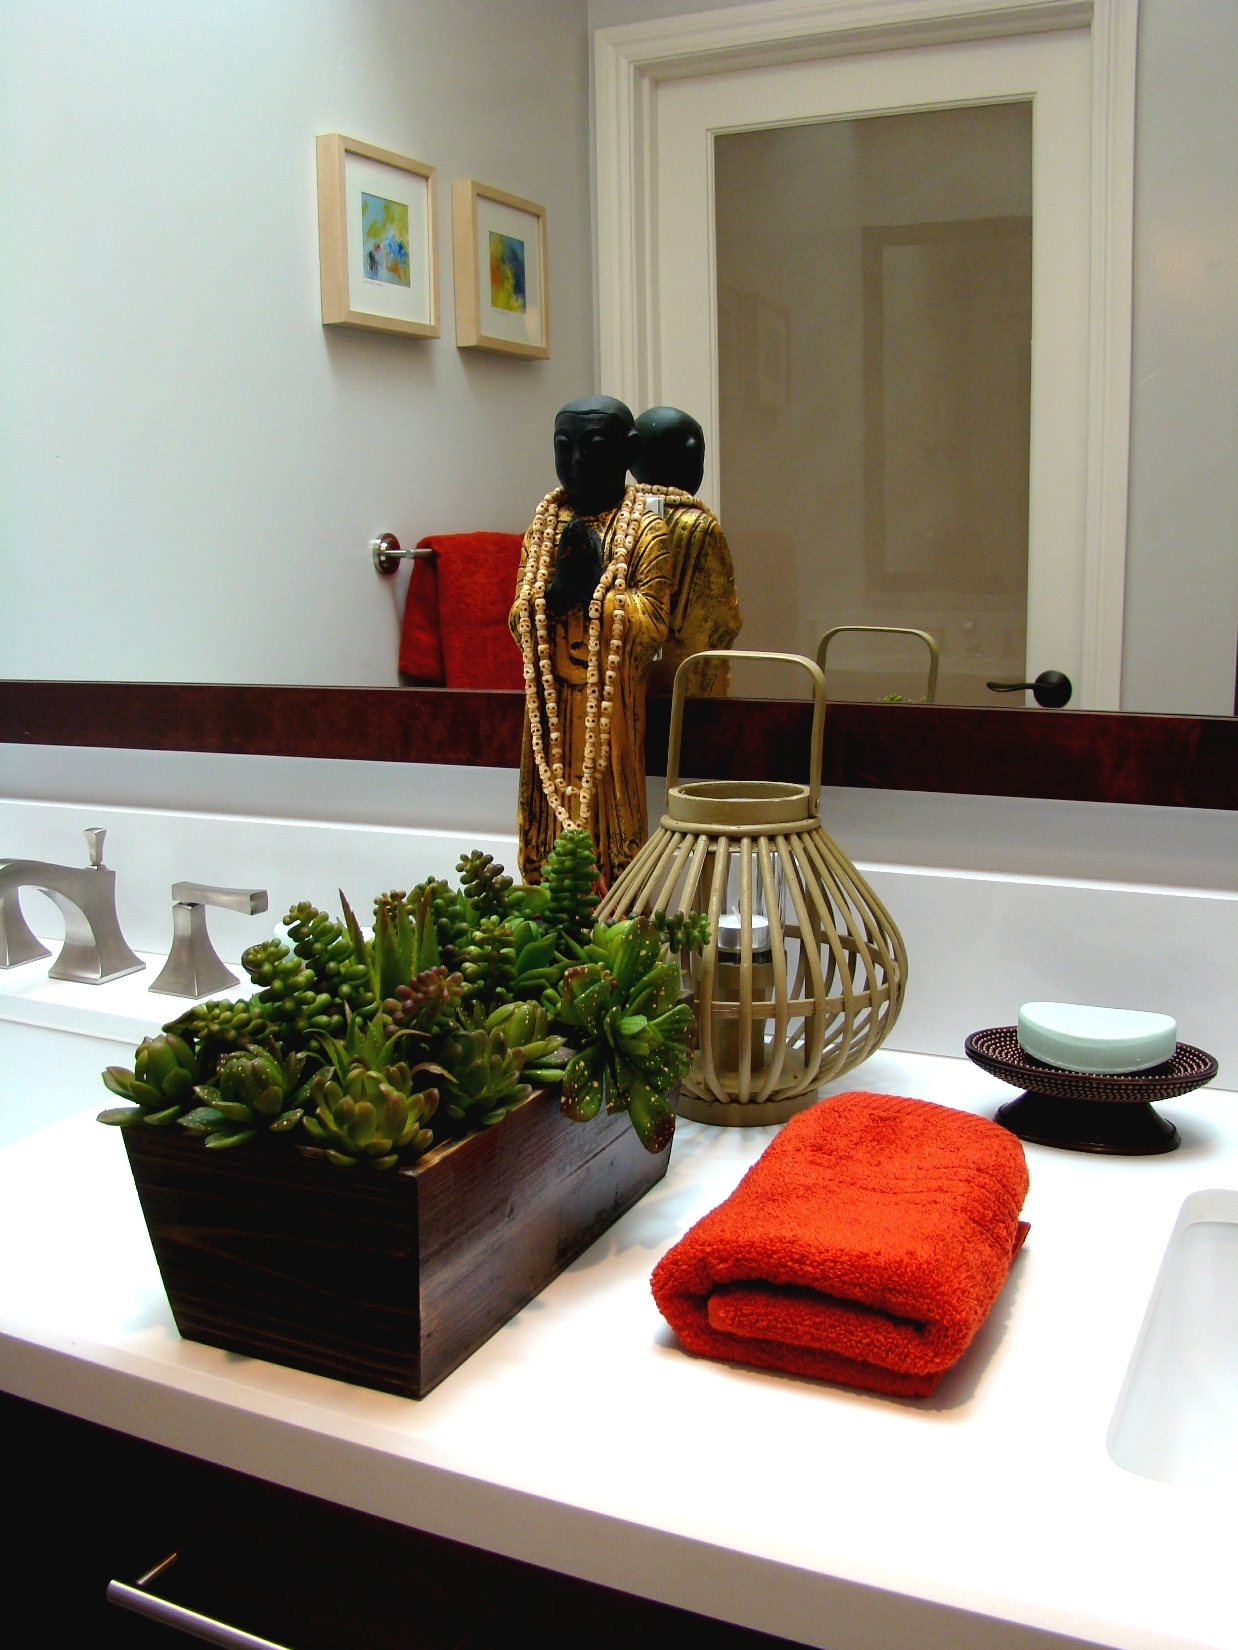 Fiorito Interior Design, interior design, remodel, bathroom, transitional, custom vanity, double sinks, framed mirror